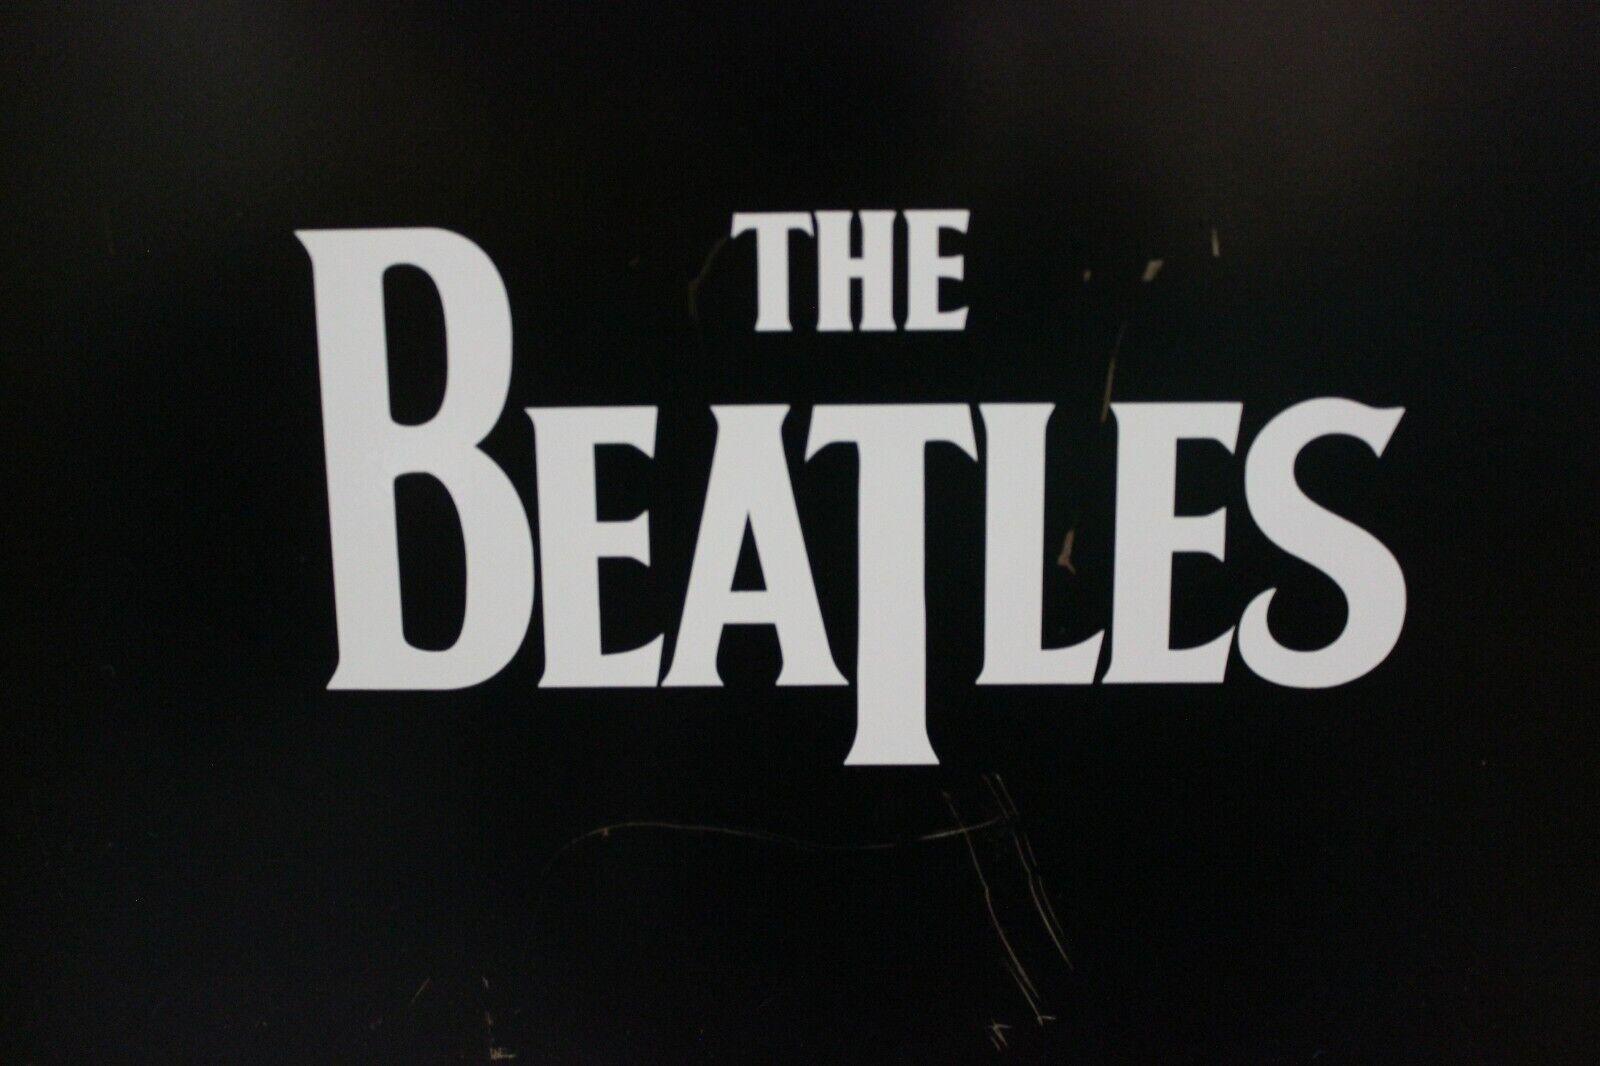 The Beatles Vinyl Car Laptop Decal Sticker